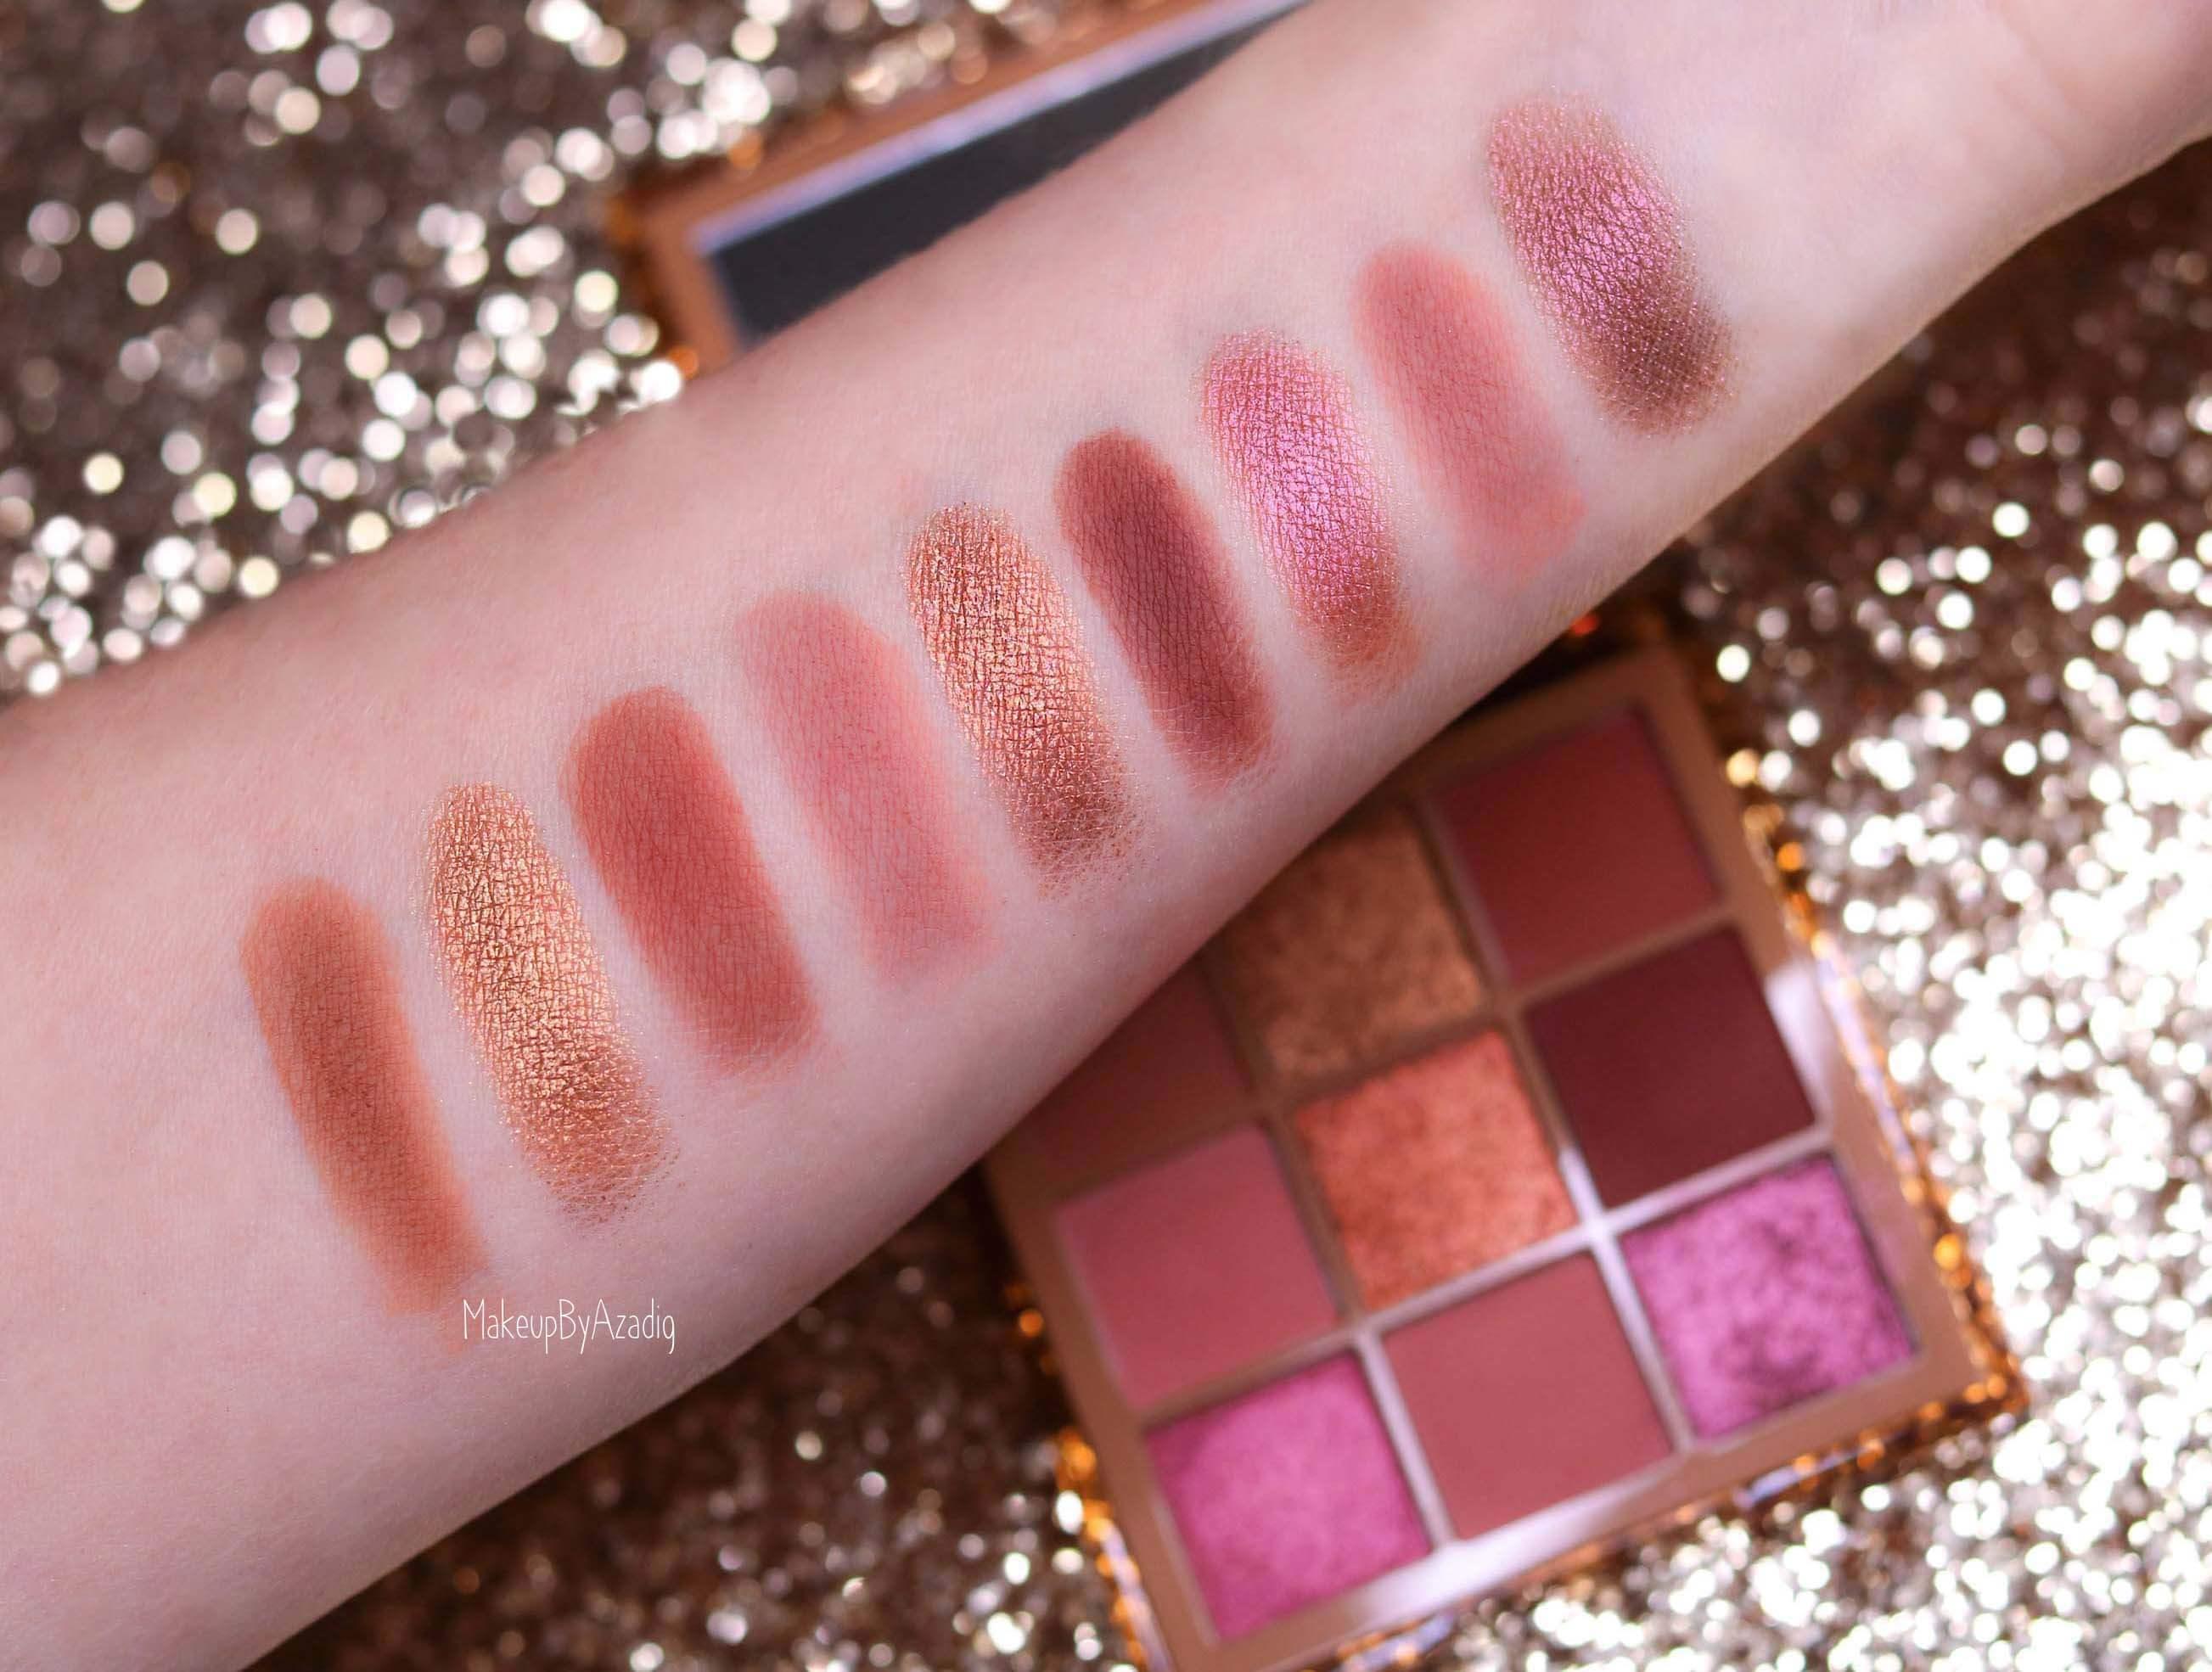 revue-palette-nude-obsessions-medium-huda-beauty-makeupbyazadig-avis-swatch-prix-dark-light-sephora-swatches